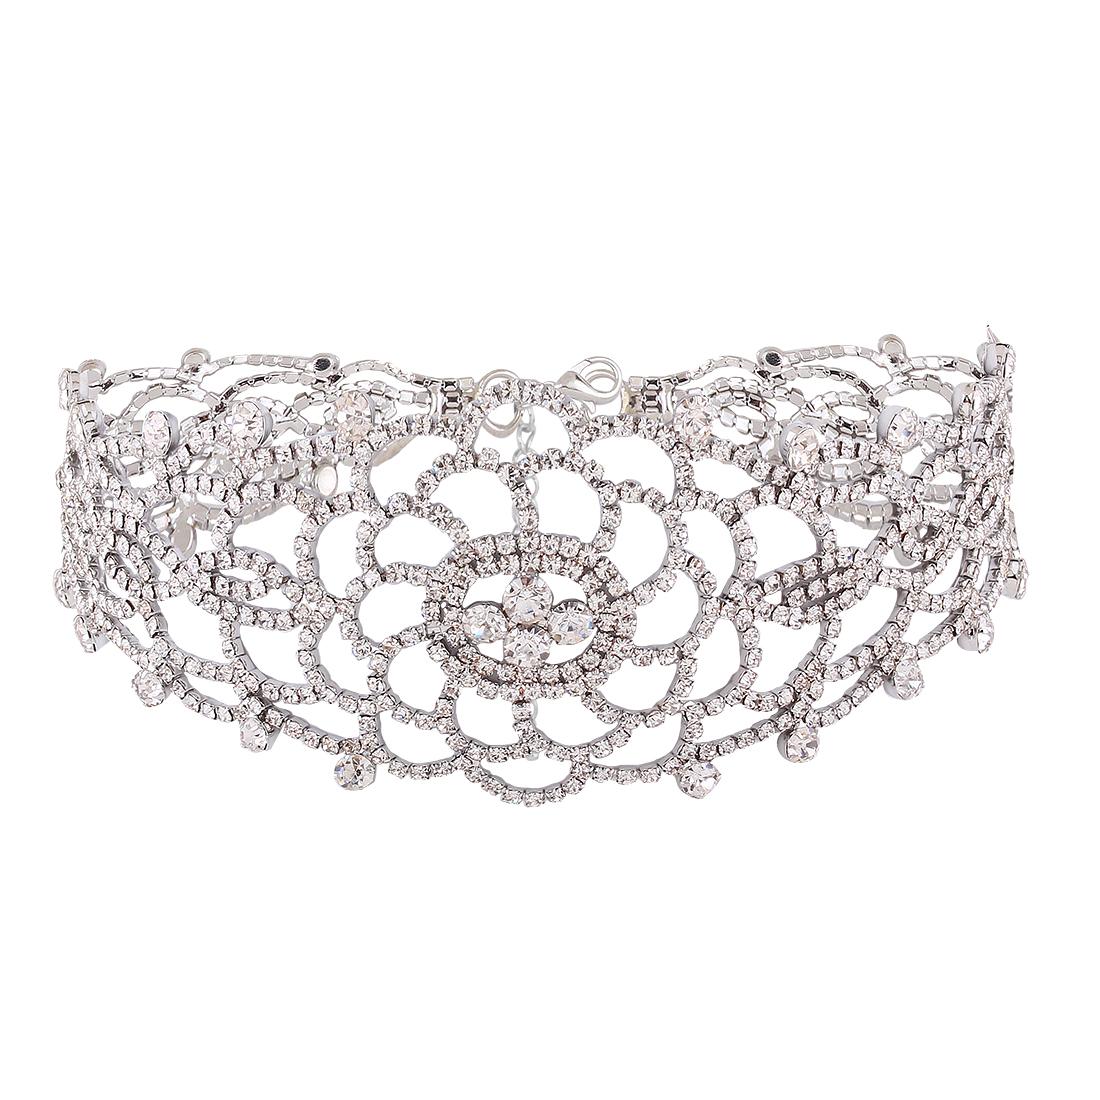 5cab3bb3bf96 Luxury Full Diamond Pendant Chain Necklace Crystal Rhinestone Choker Collar  Women Wedding Jewelry · 1482204368 2146. ...